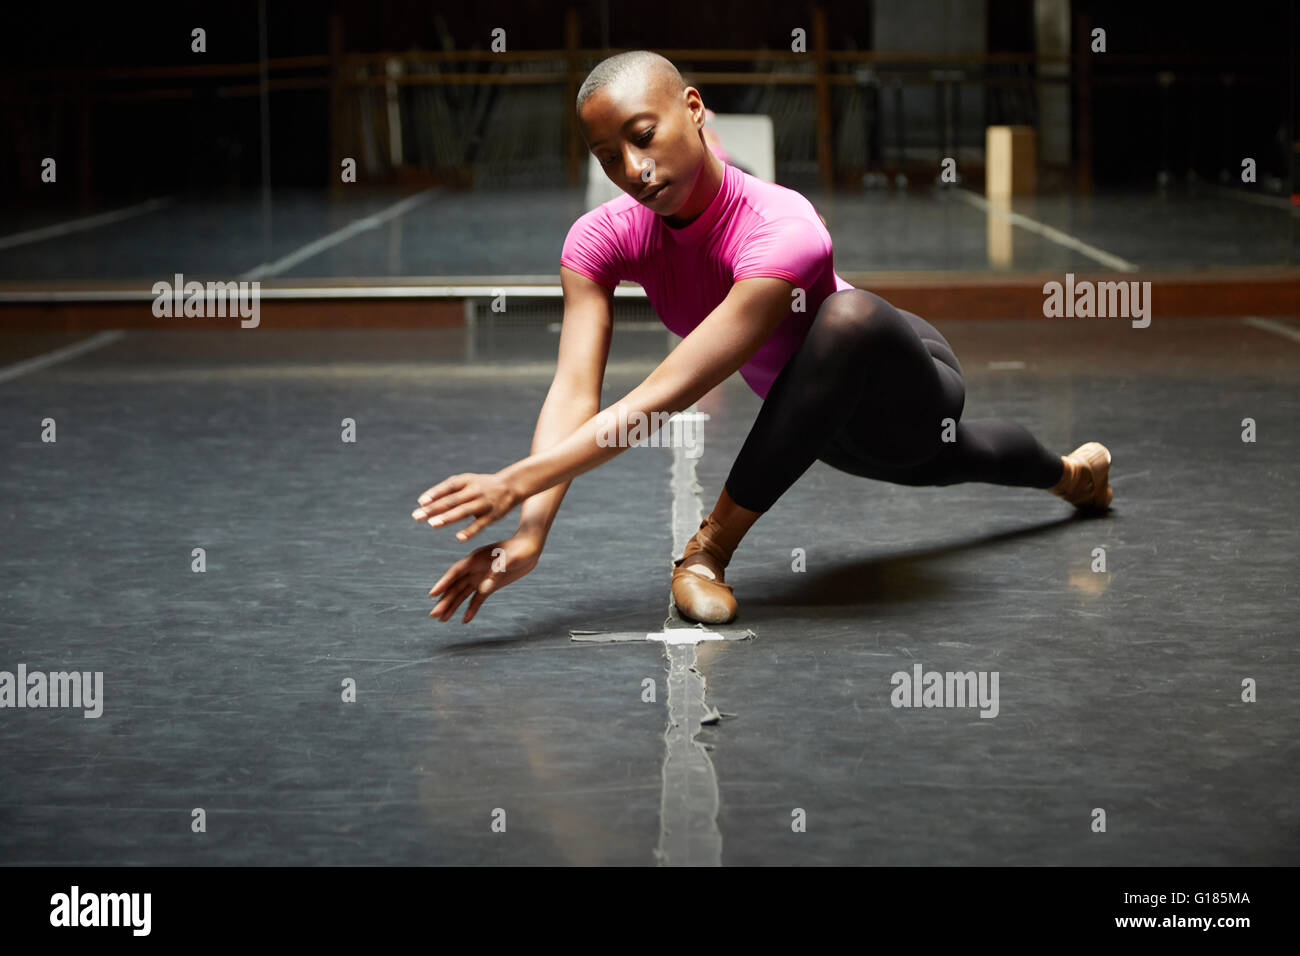 Ballet dancer in dance move Stock Photo